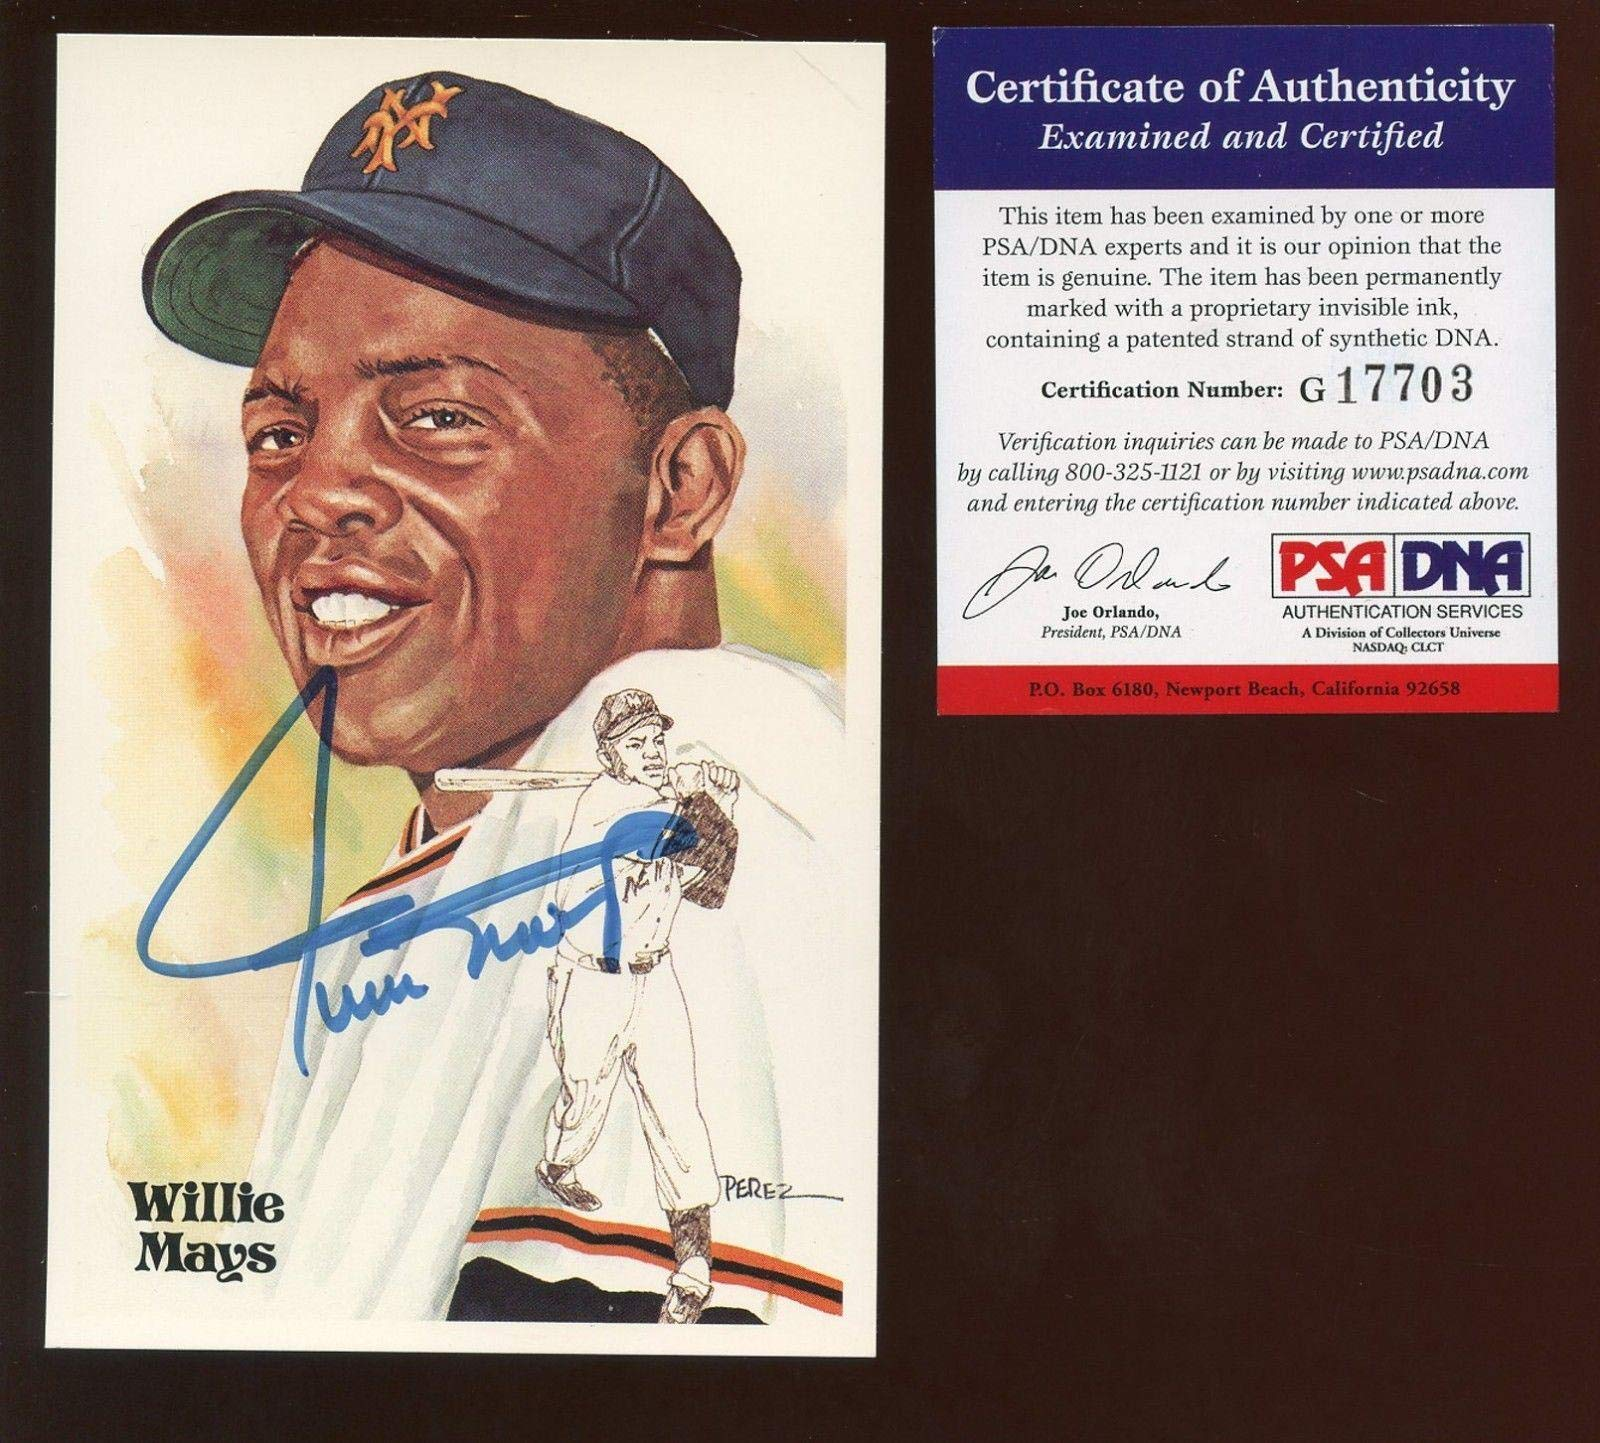 1981 Perez Steele Baseball Postcard Willie Mays Autographed PSA Cert MLB Cut Signatures